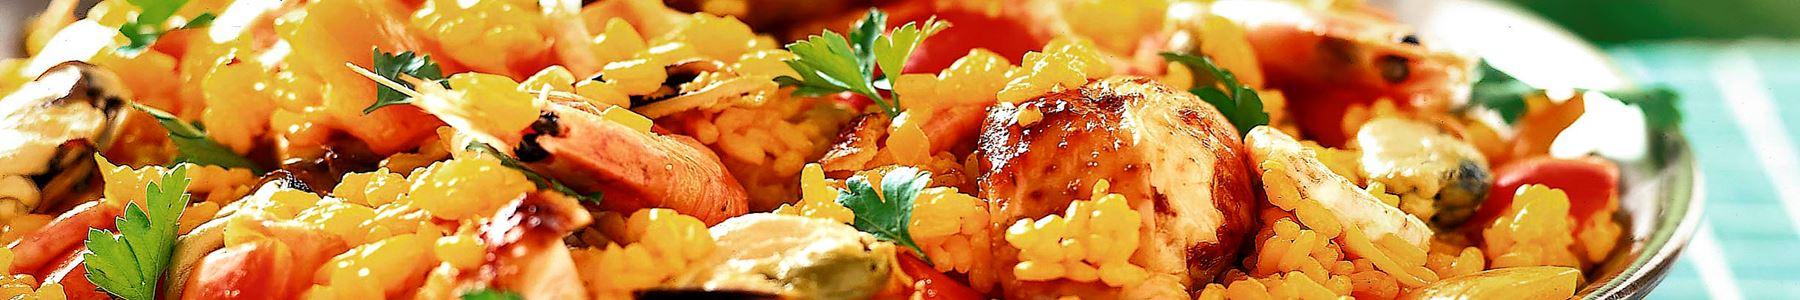 Musslor + Tomat + Paella